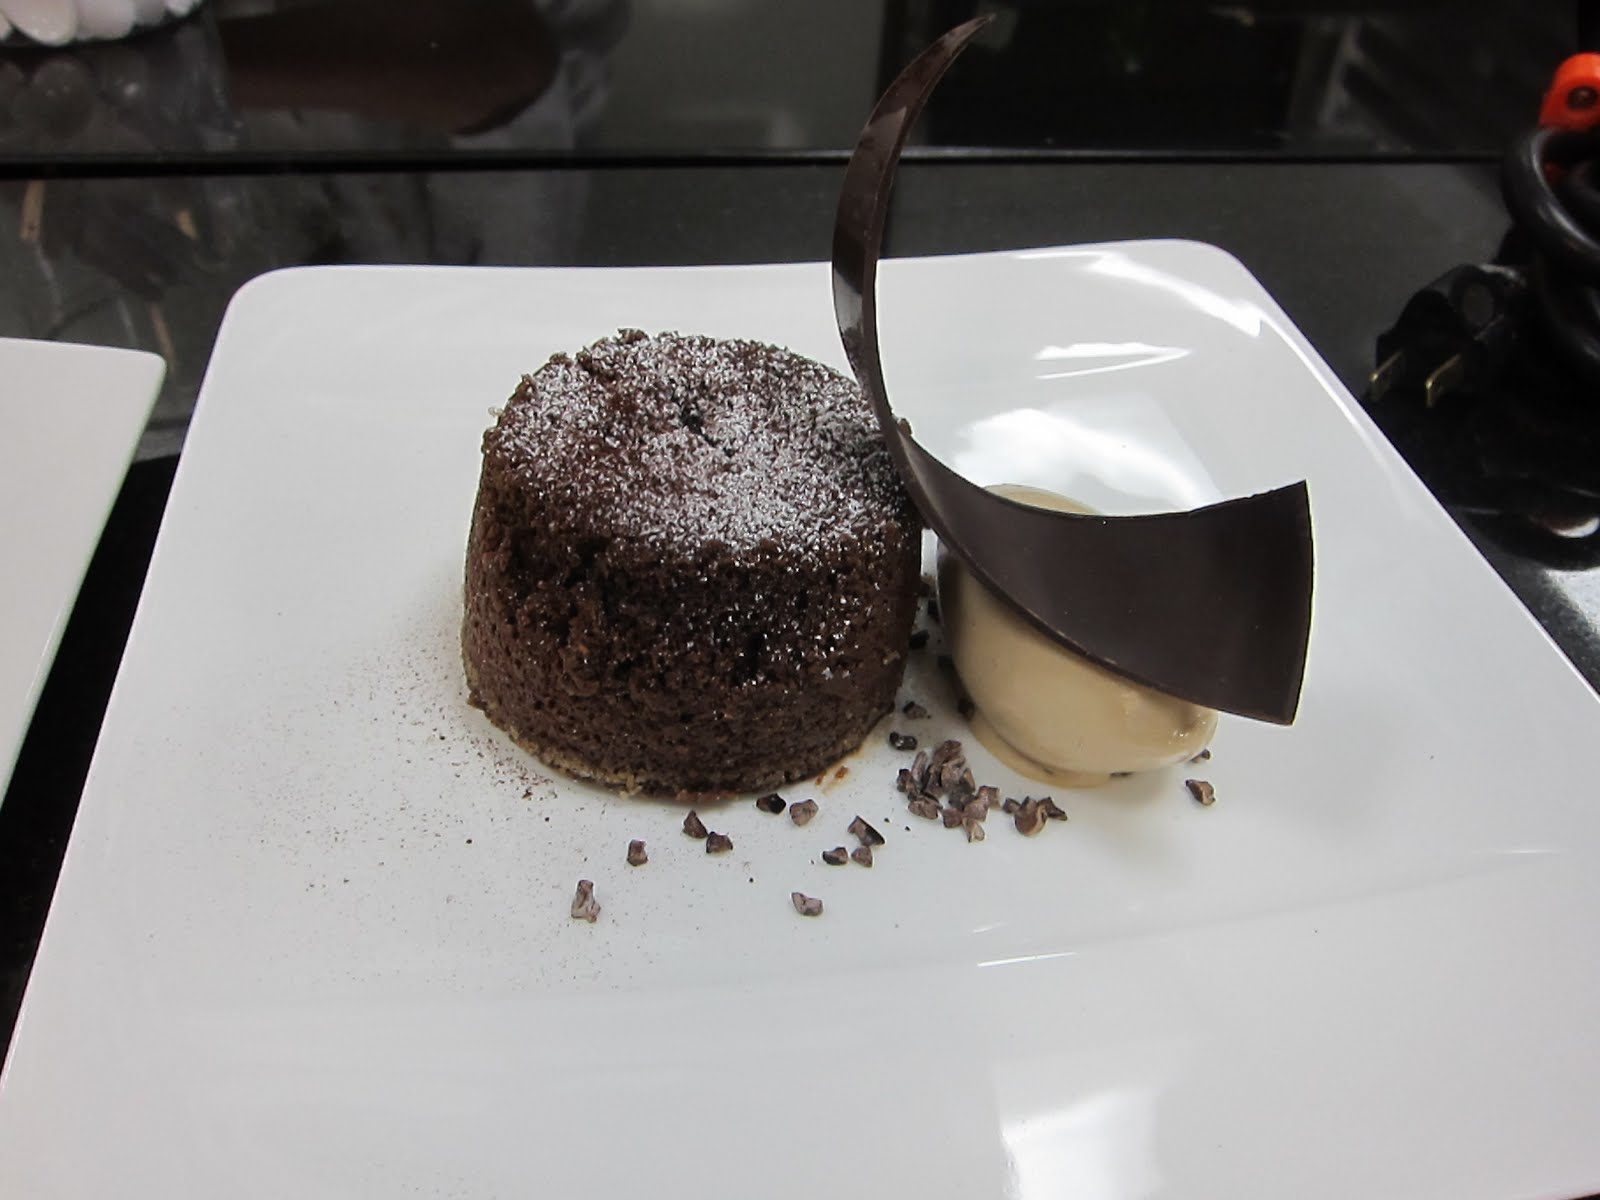 Baking Blind Plated Dessert Week One